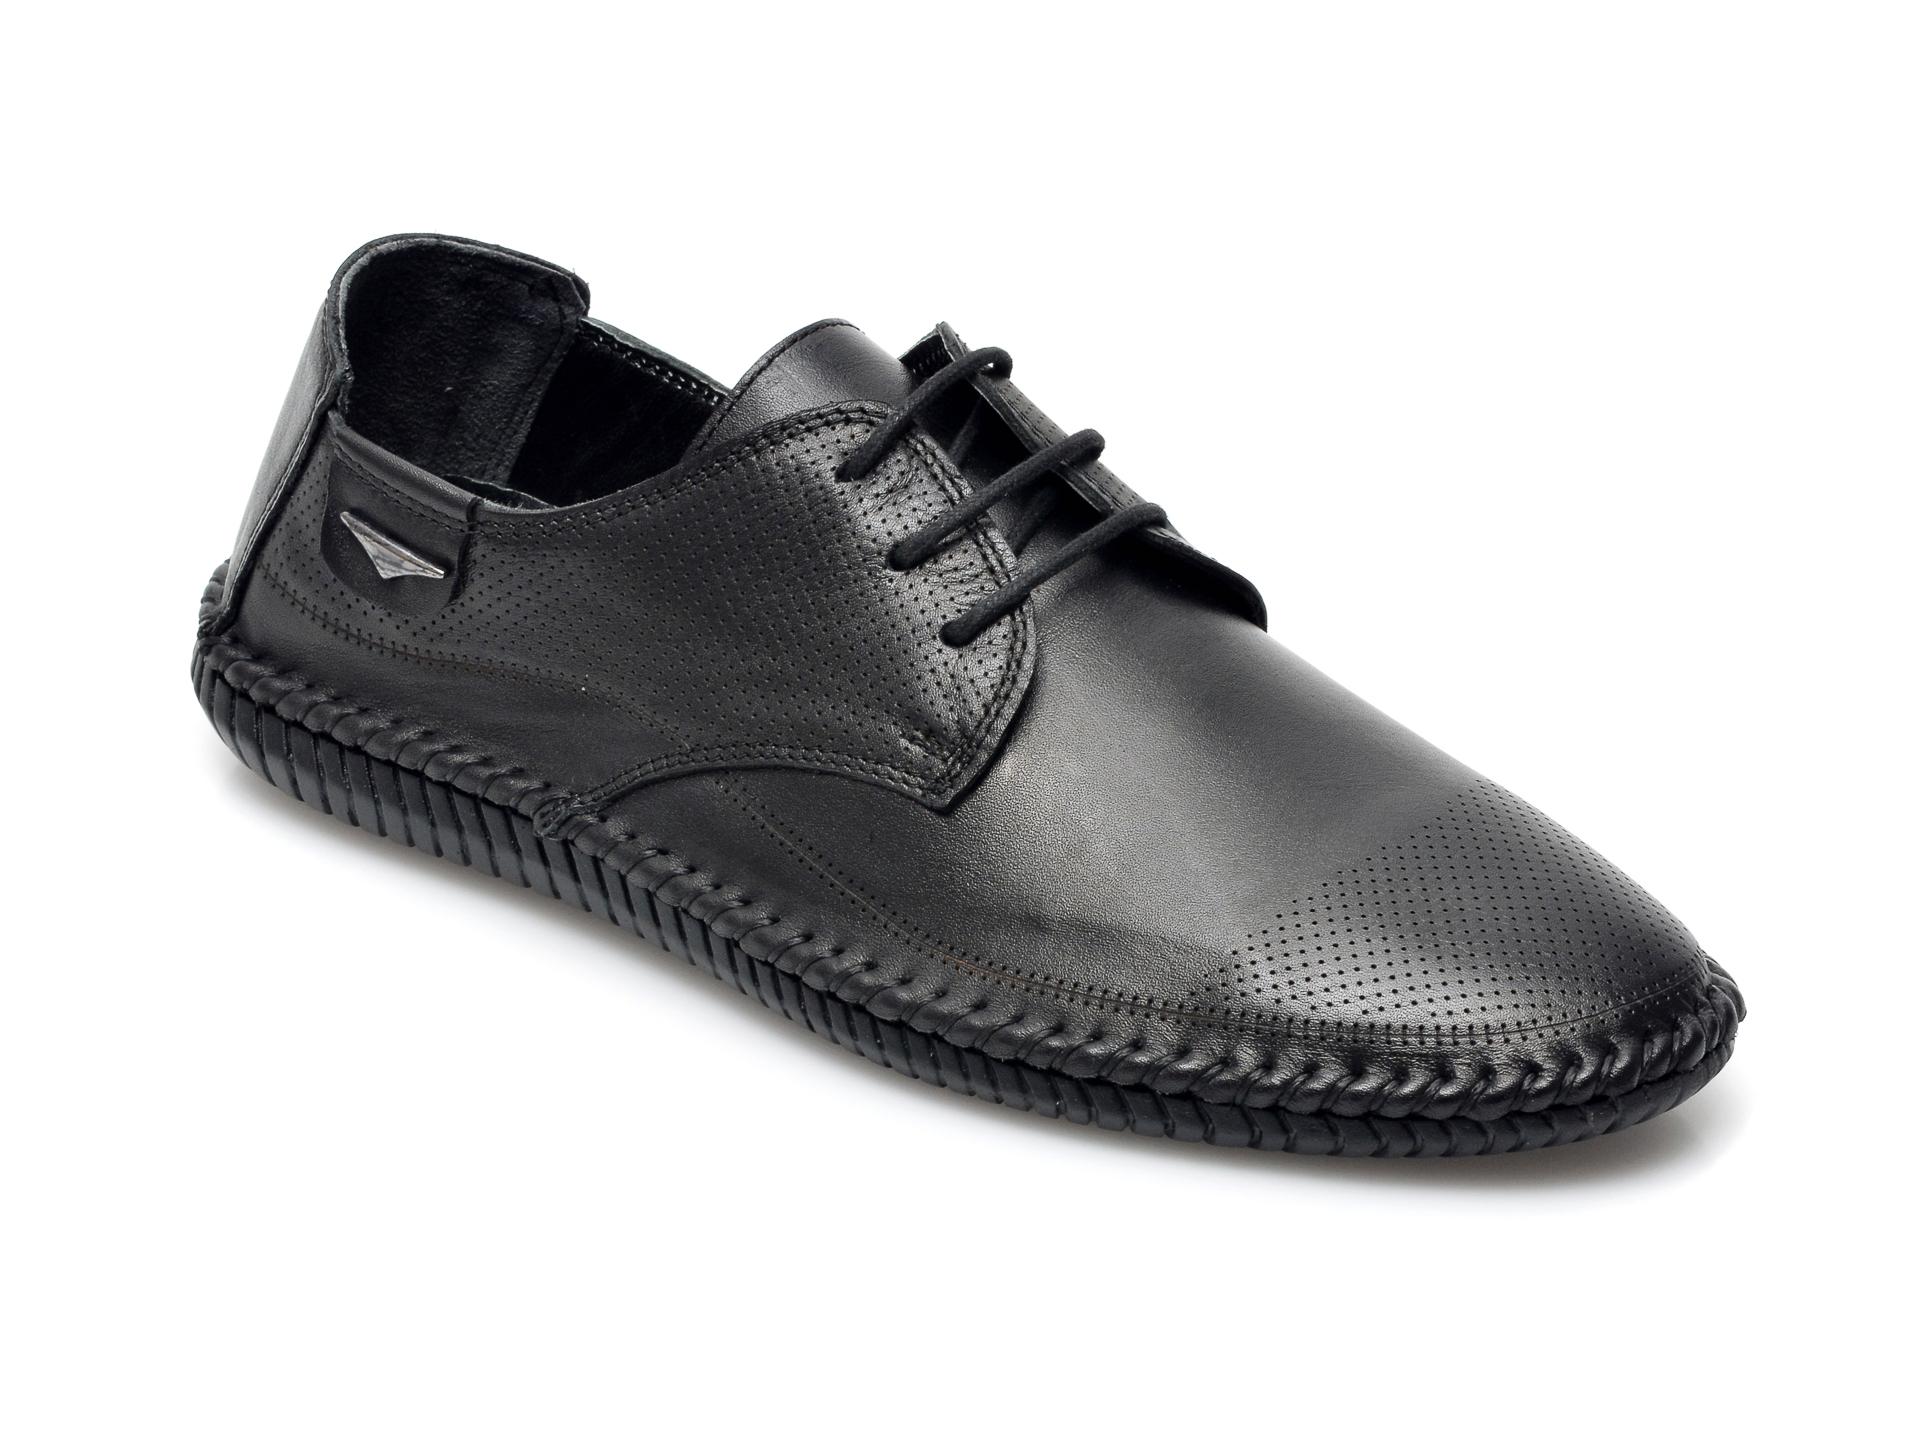 Pantofi OTTER negri, M5789, din piele naturala